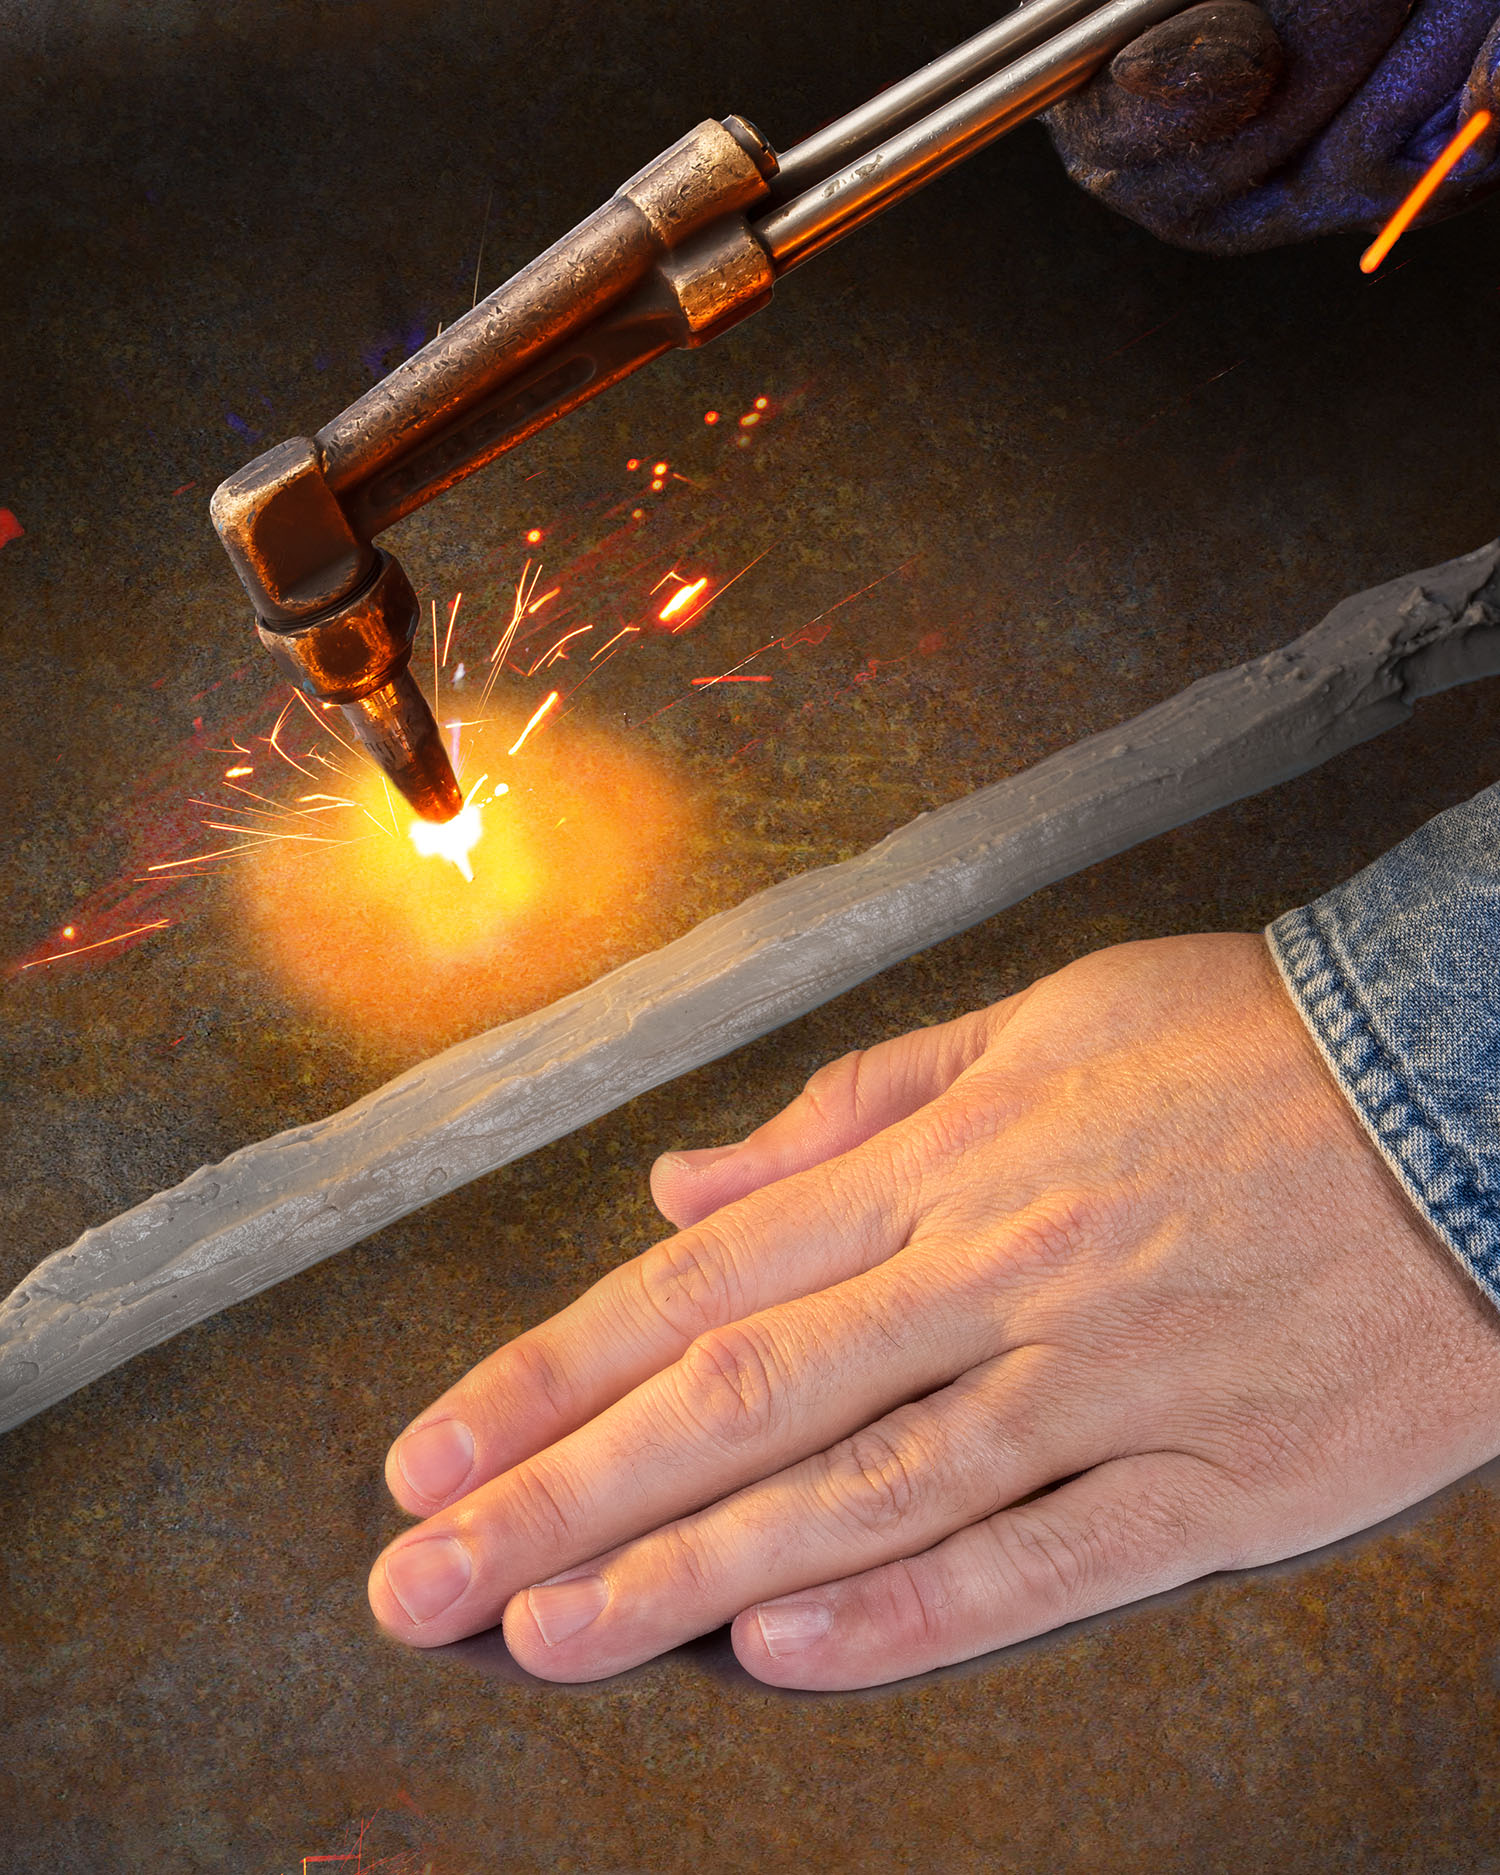 Heat Absorbing Flooring : Heat absorbing compound blocks transfer through metal